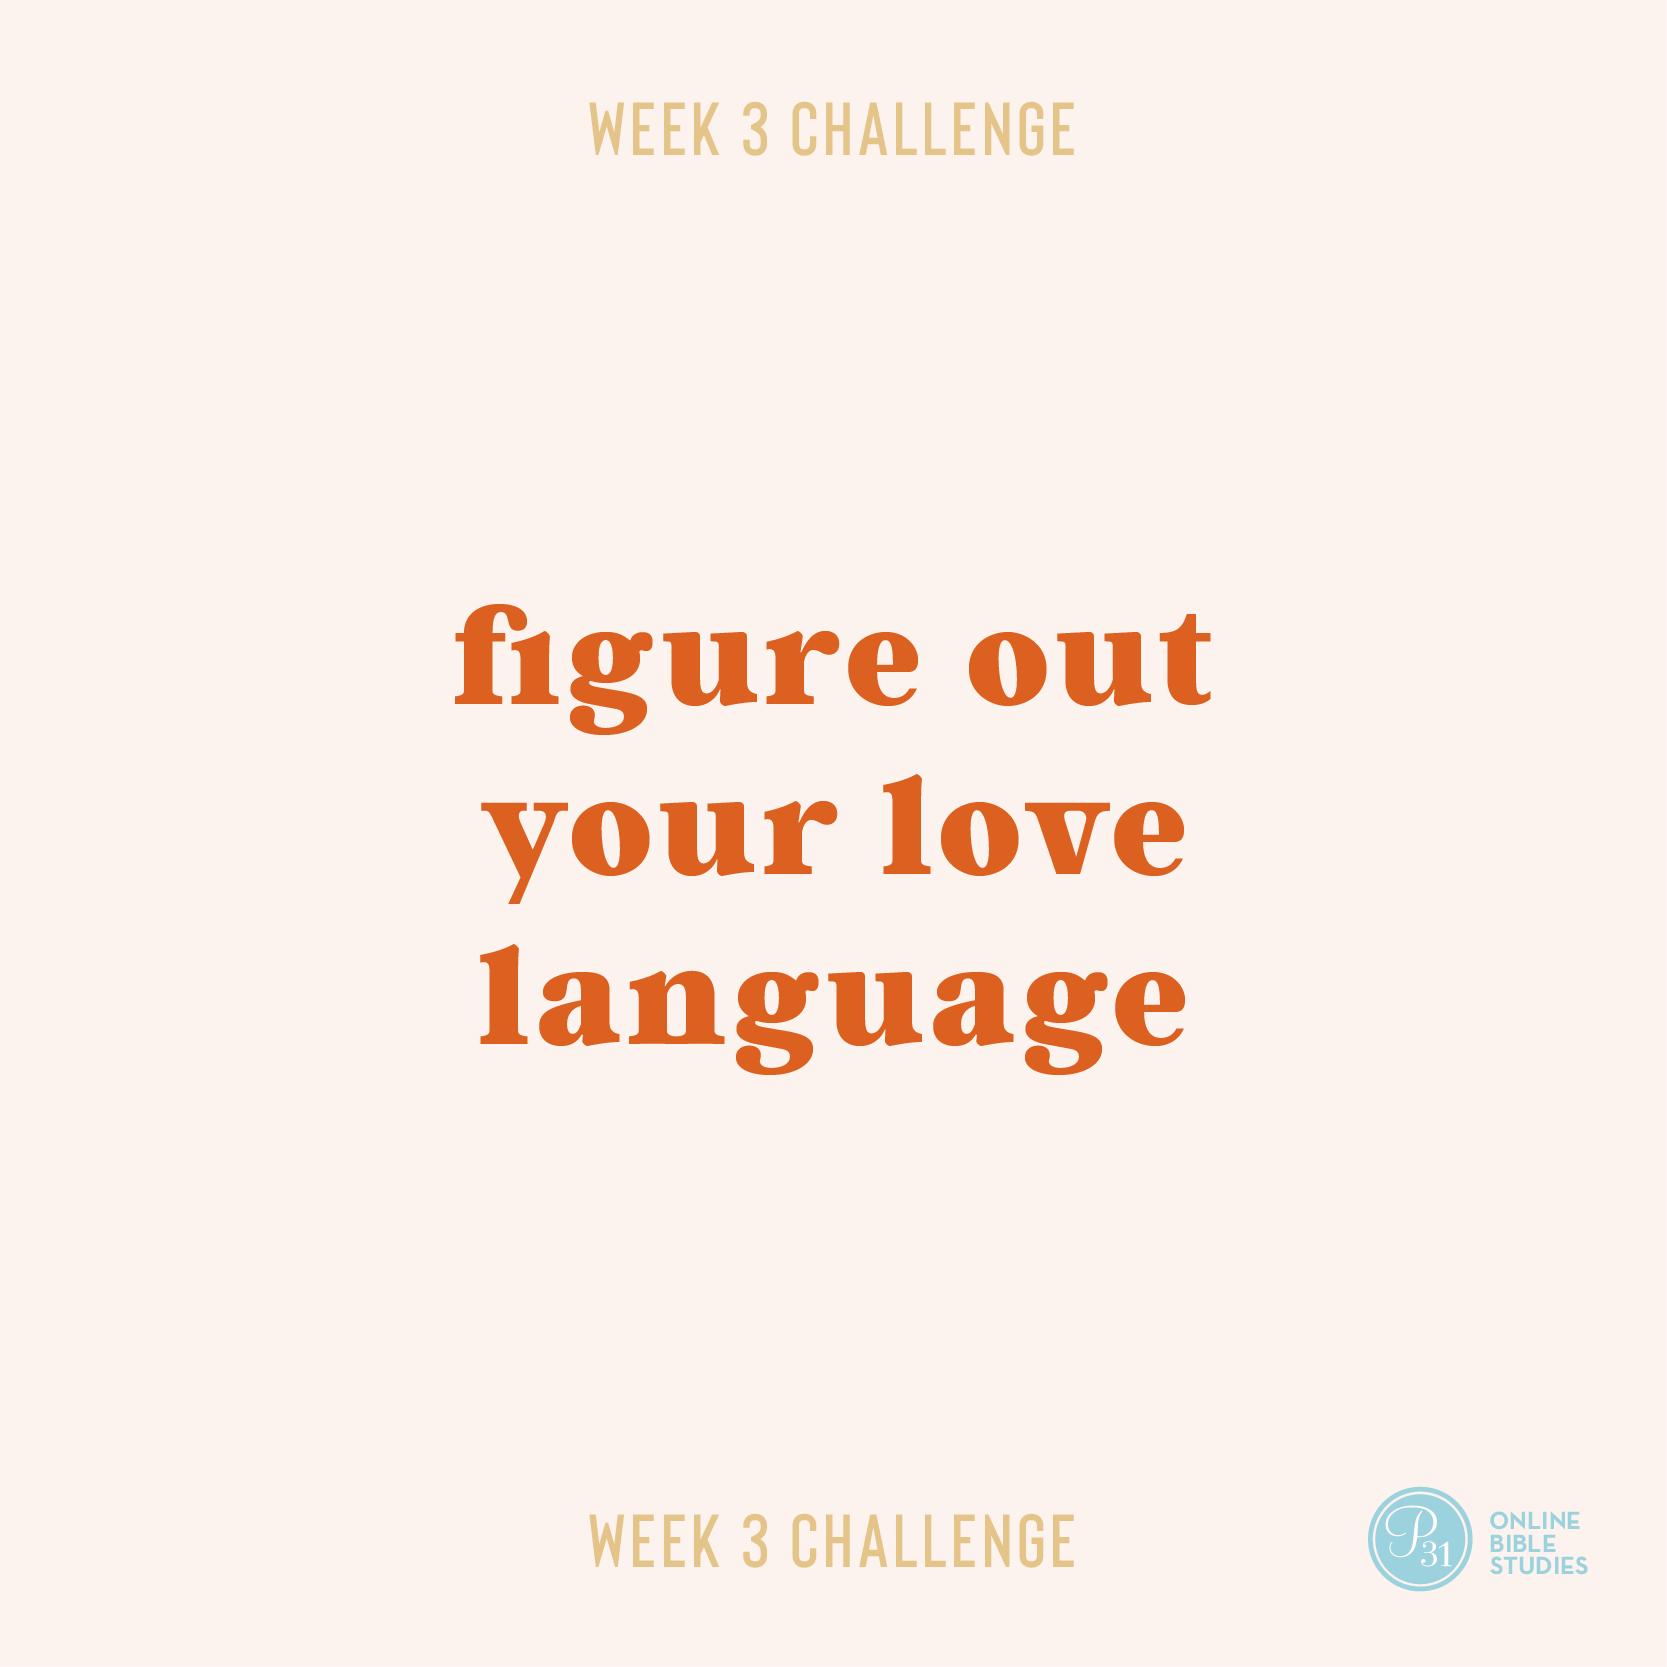 """Figure out your love language.""   Proverbs 31 Online Bible Studies   Week 3 Challenge    #KeepShowingUpBook #P31OBS"